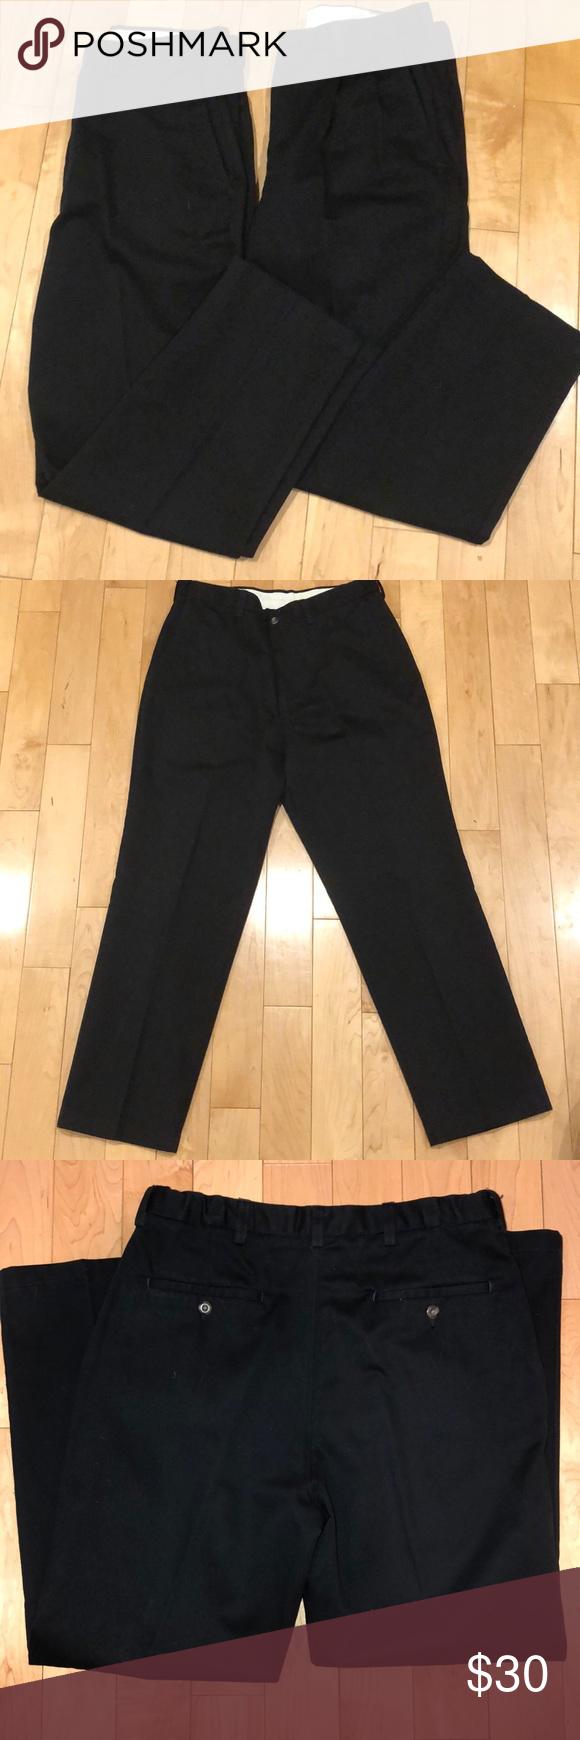 2 Pairs Of Men S Black Dress Work Pants 34x30 Dresses For Work Work Pants Mens Black Dress [ 1740 x 580 Pixel ]